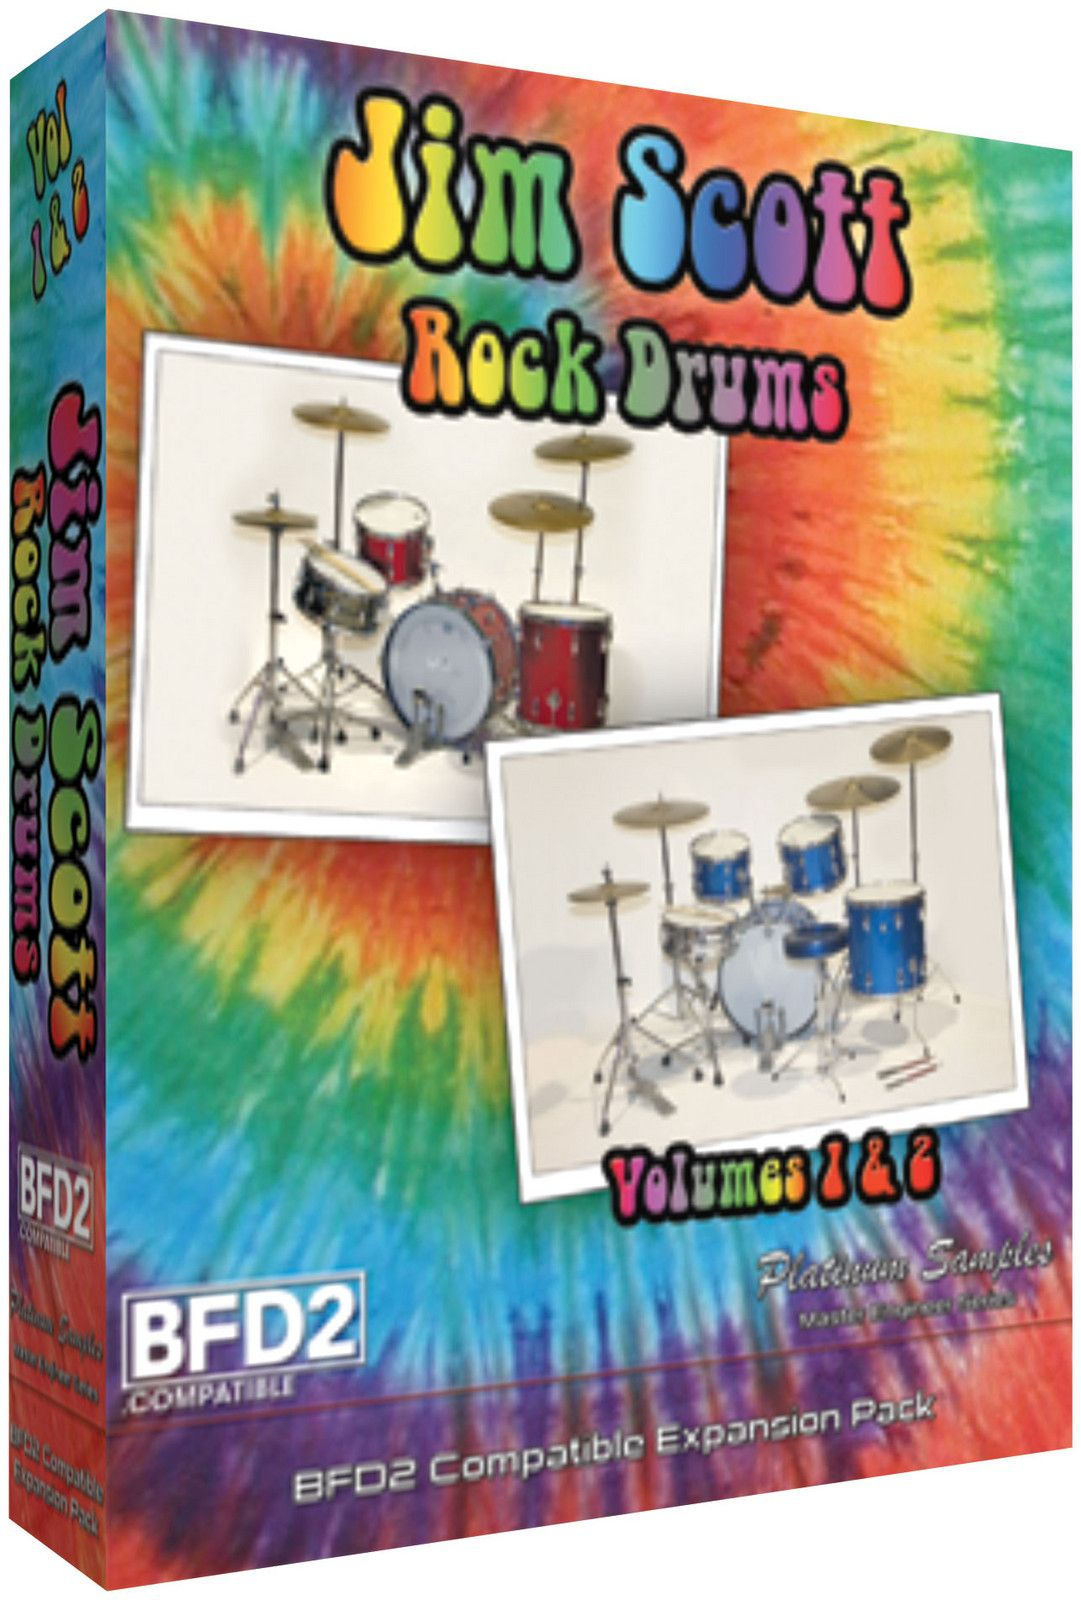 Platinum Samples Jim Scott Drums Volume 1 and 2 Drums